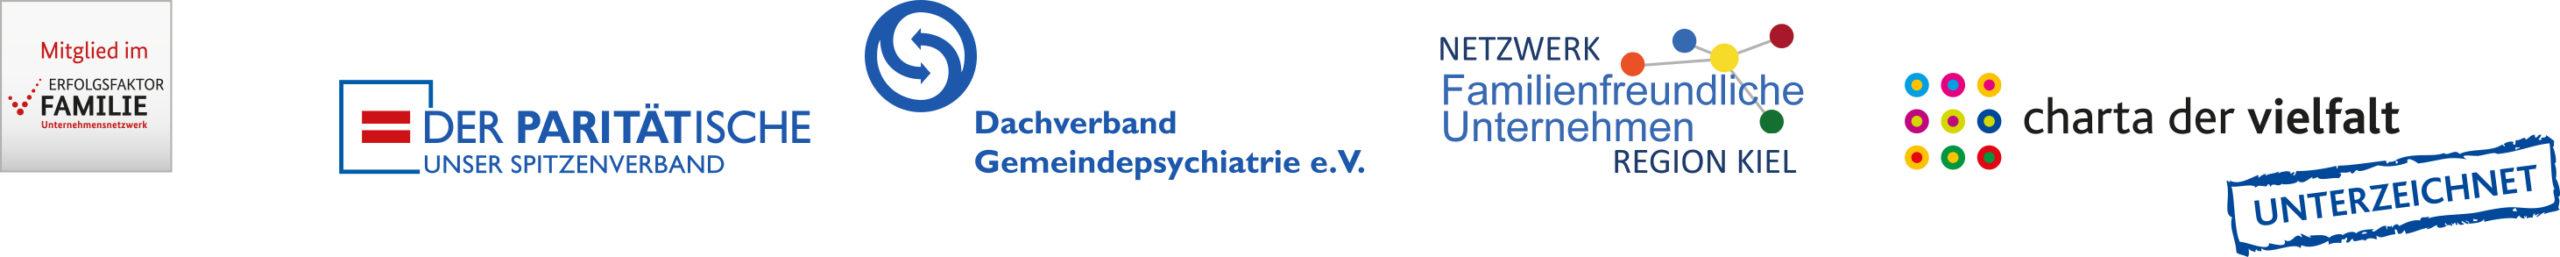 Logoreihe Homepage